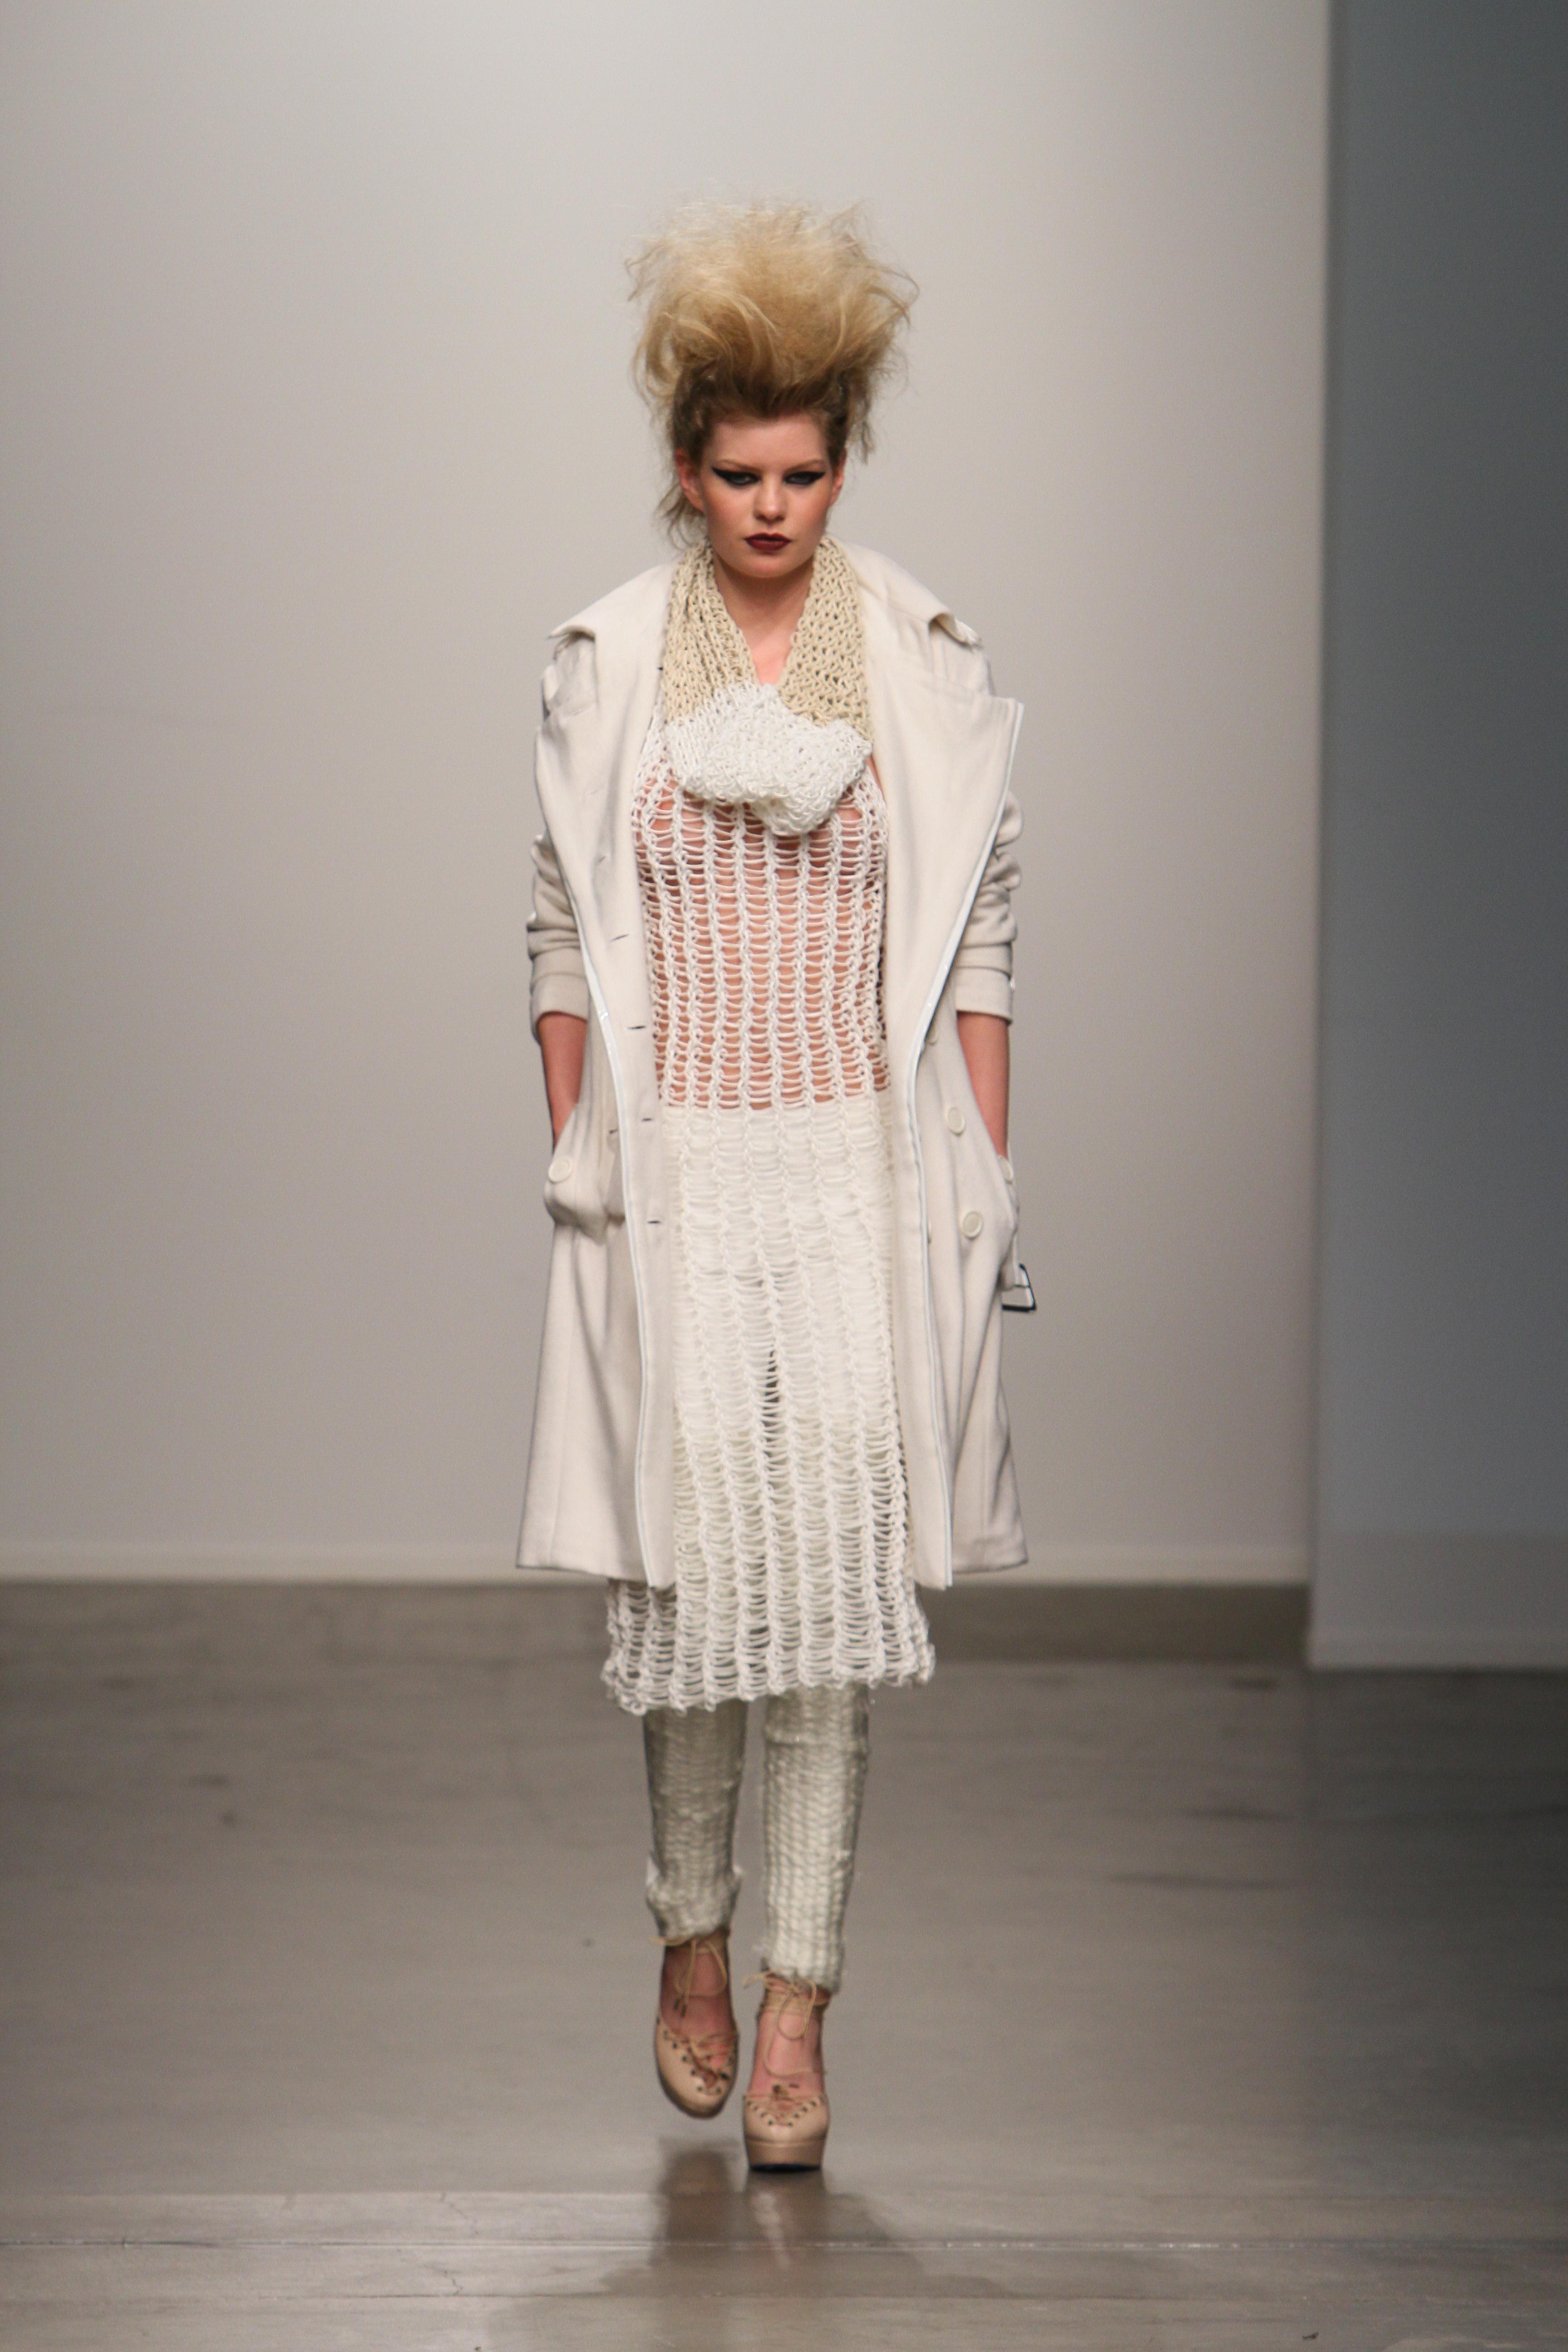 Nolcha Fashion Week Samantha Cole London Fw 13 Style Me B A D